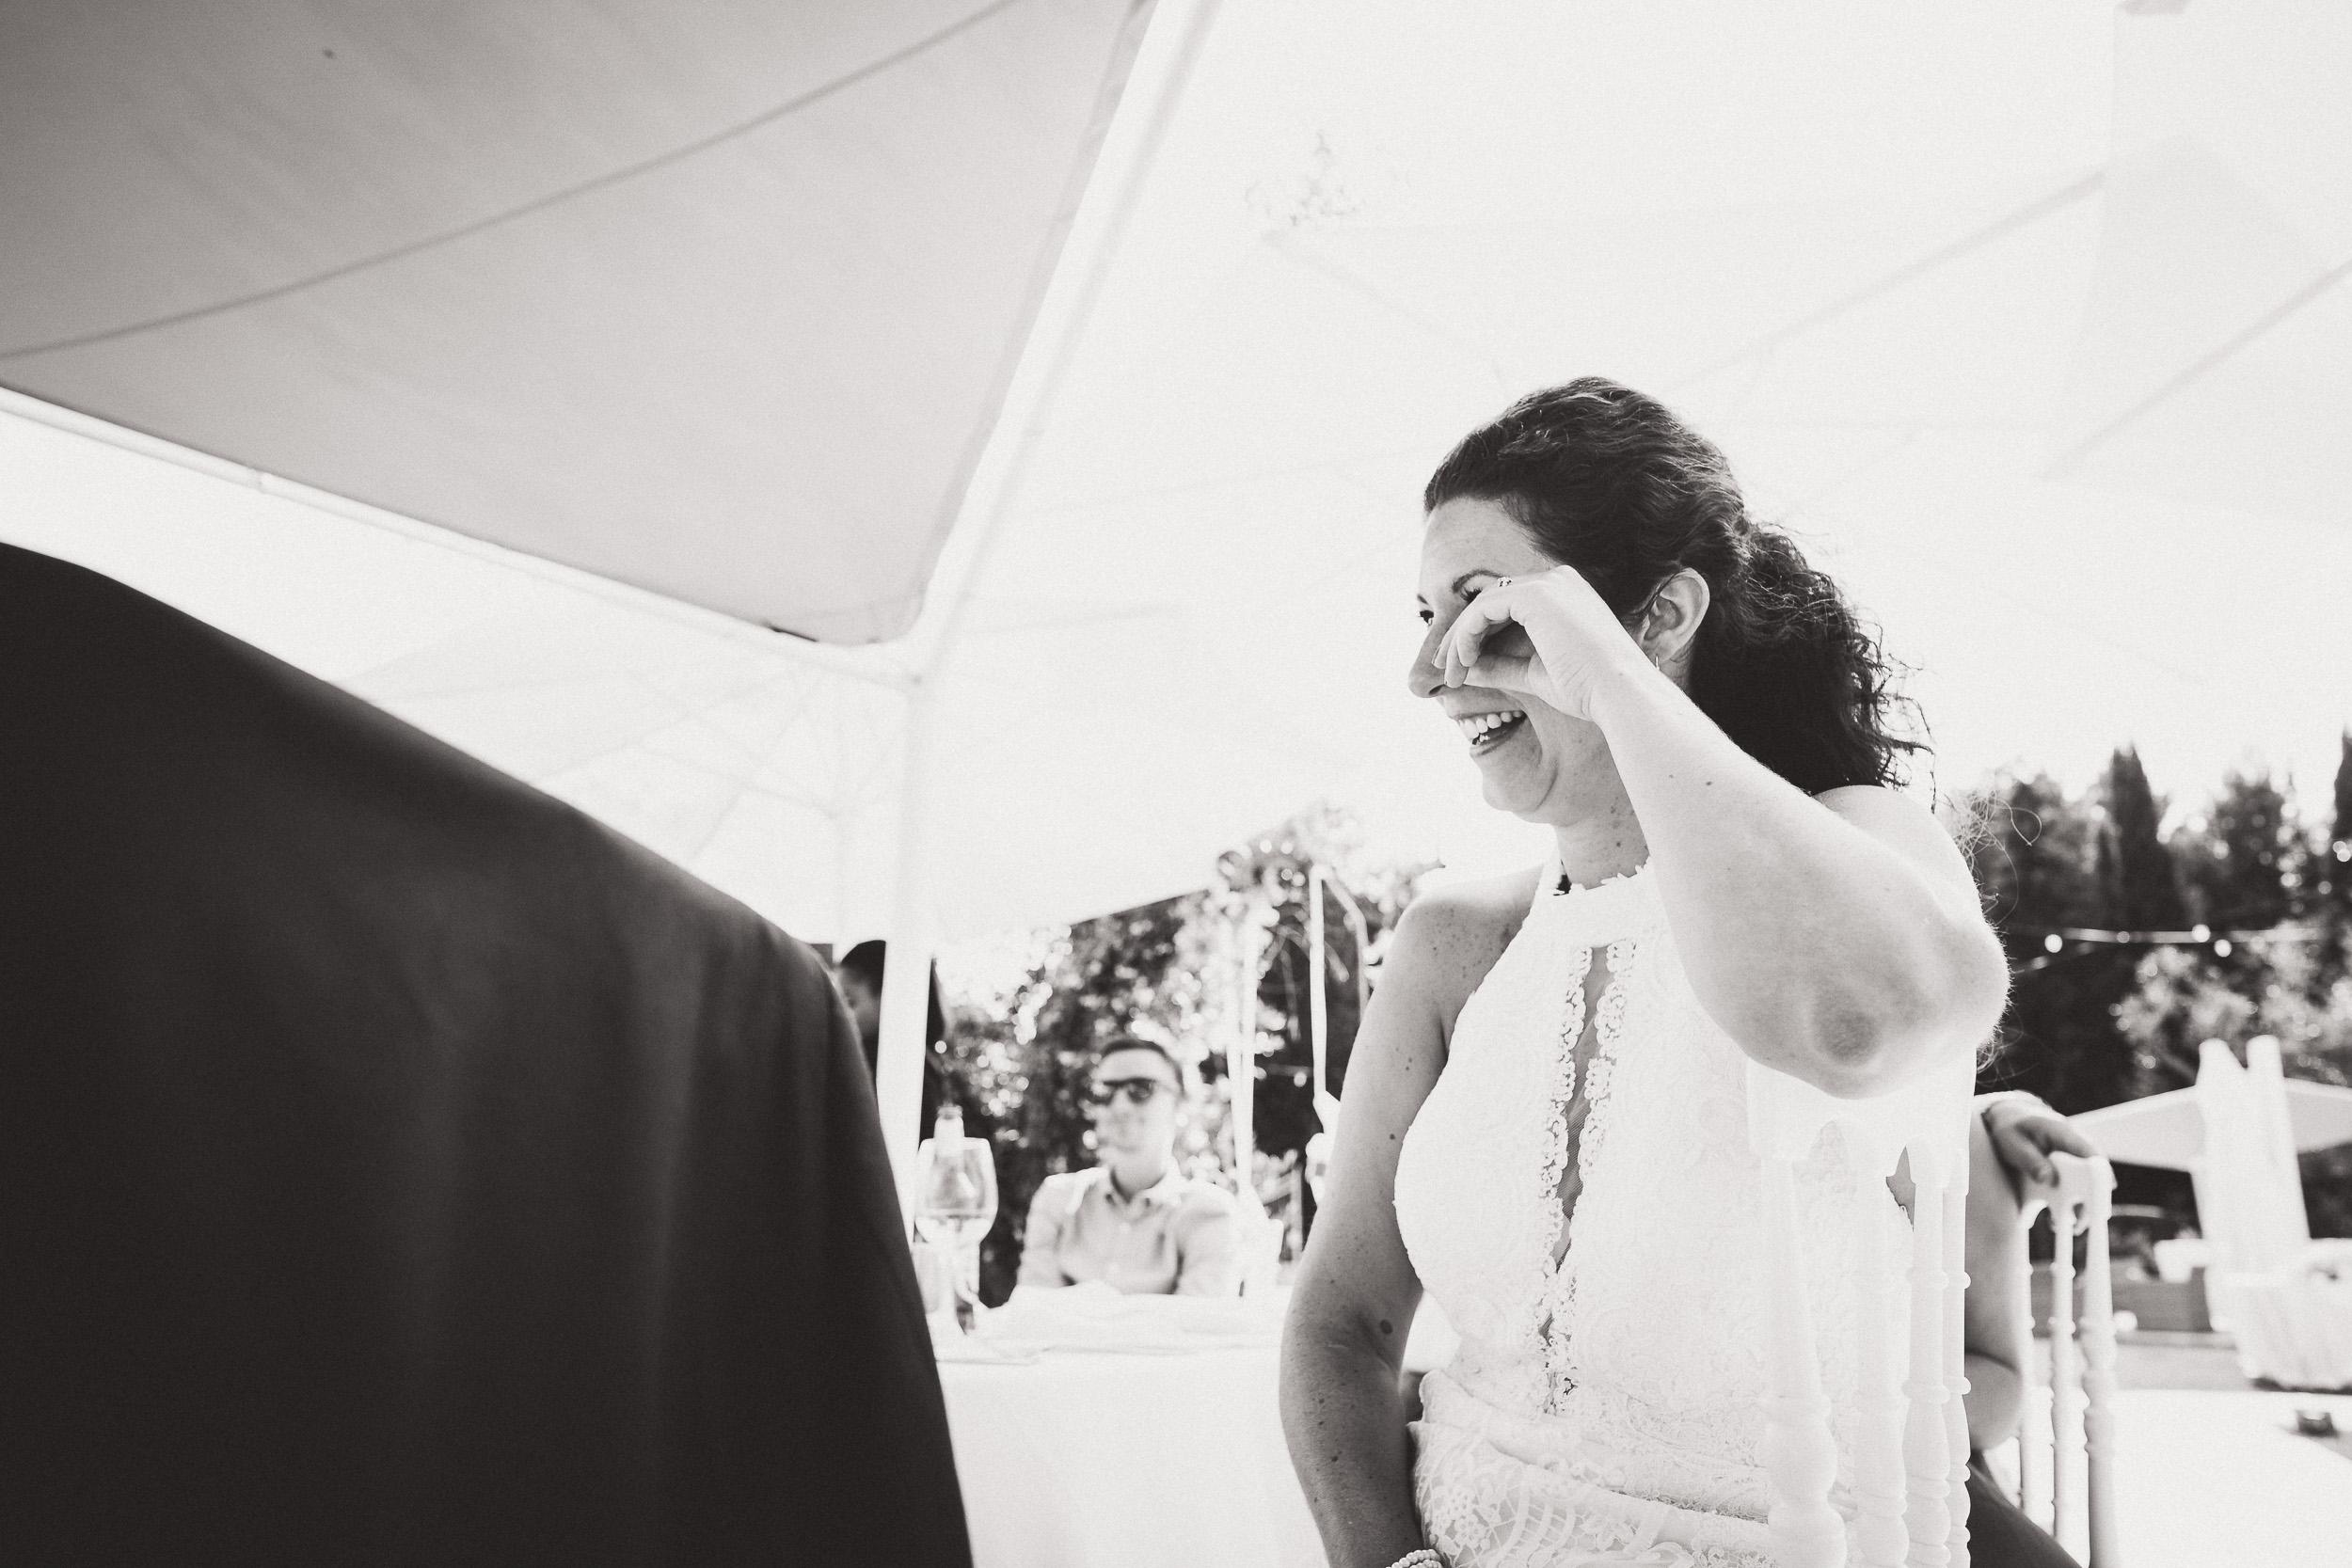 Destination wedding photography | Anna & Nigel destination wedding photography 058